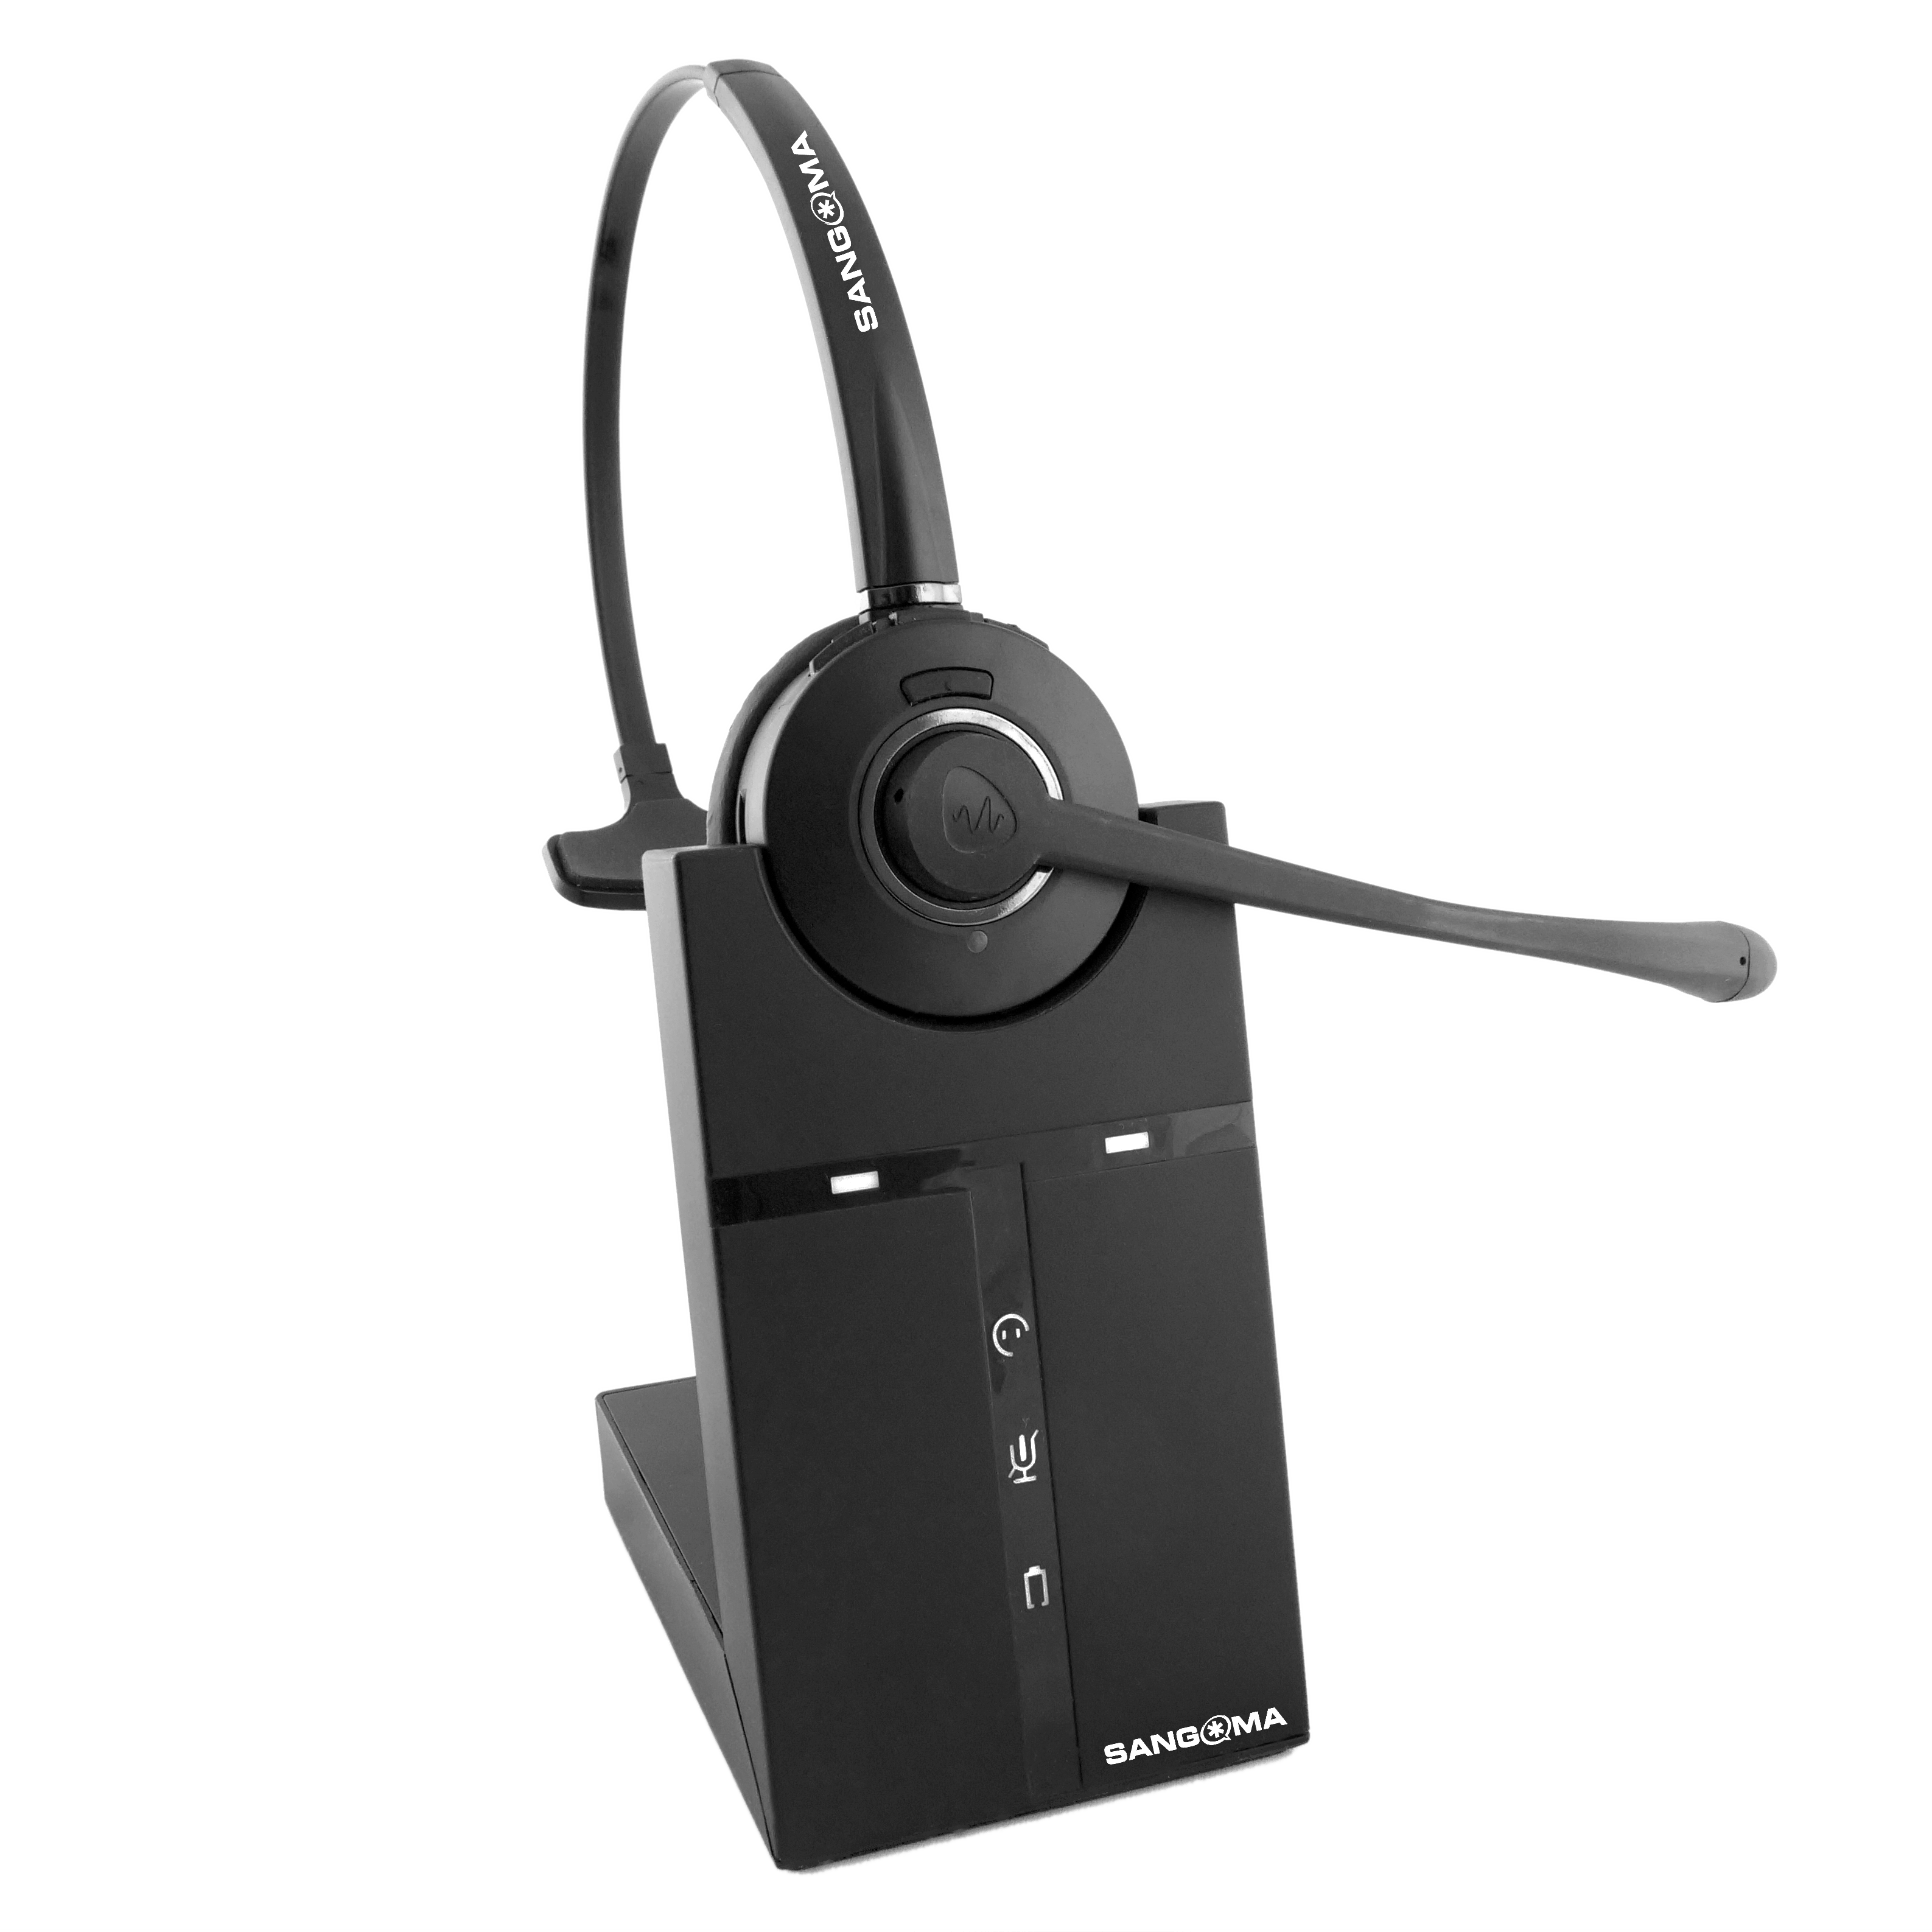 H10 Wireless Headset on Cradle